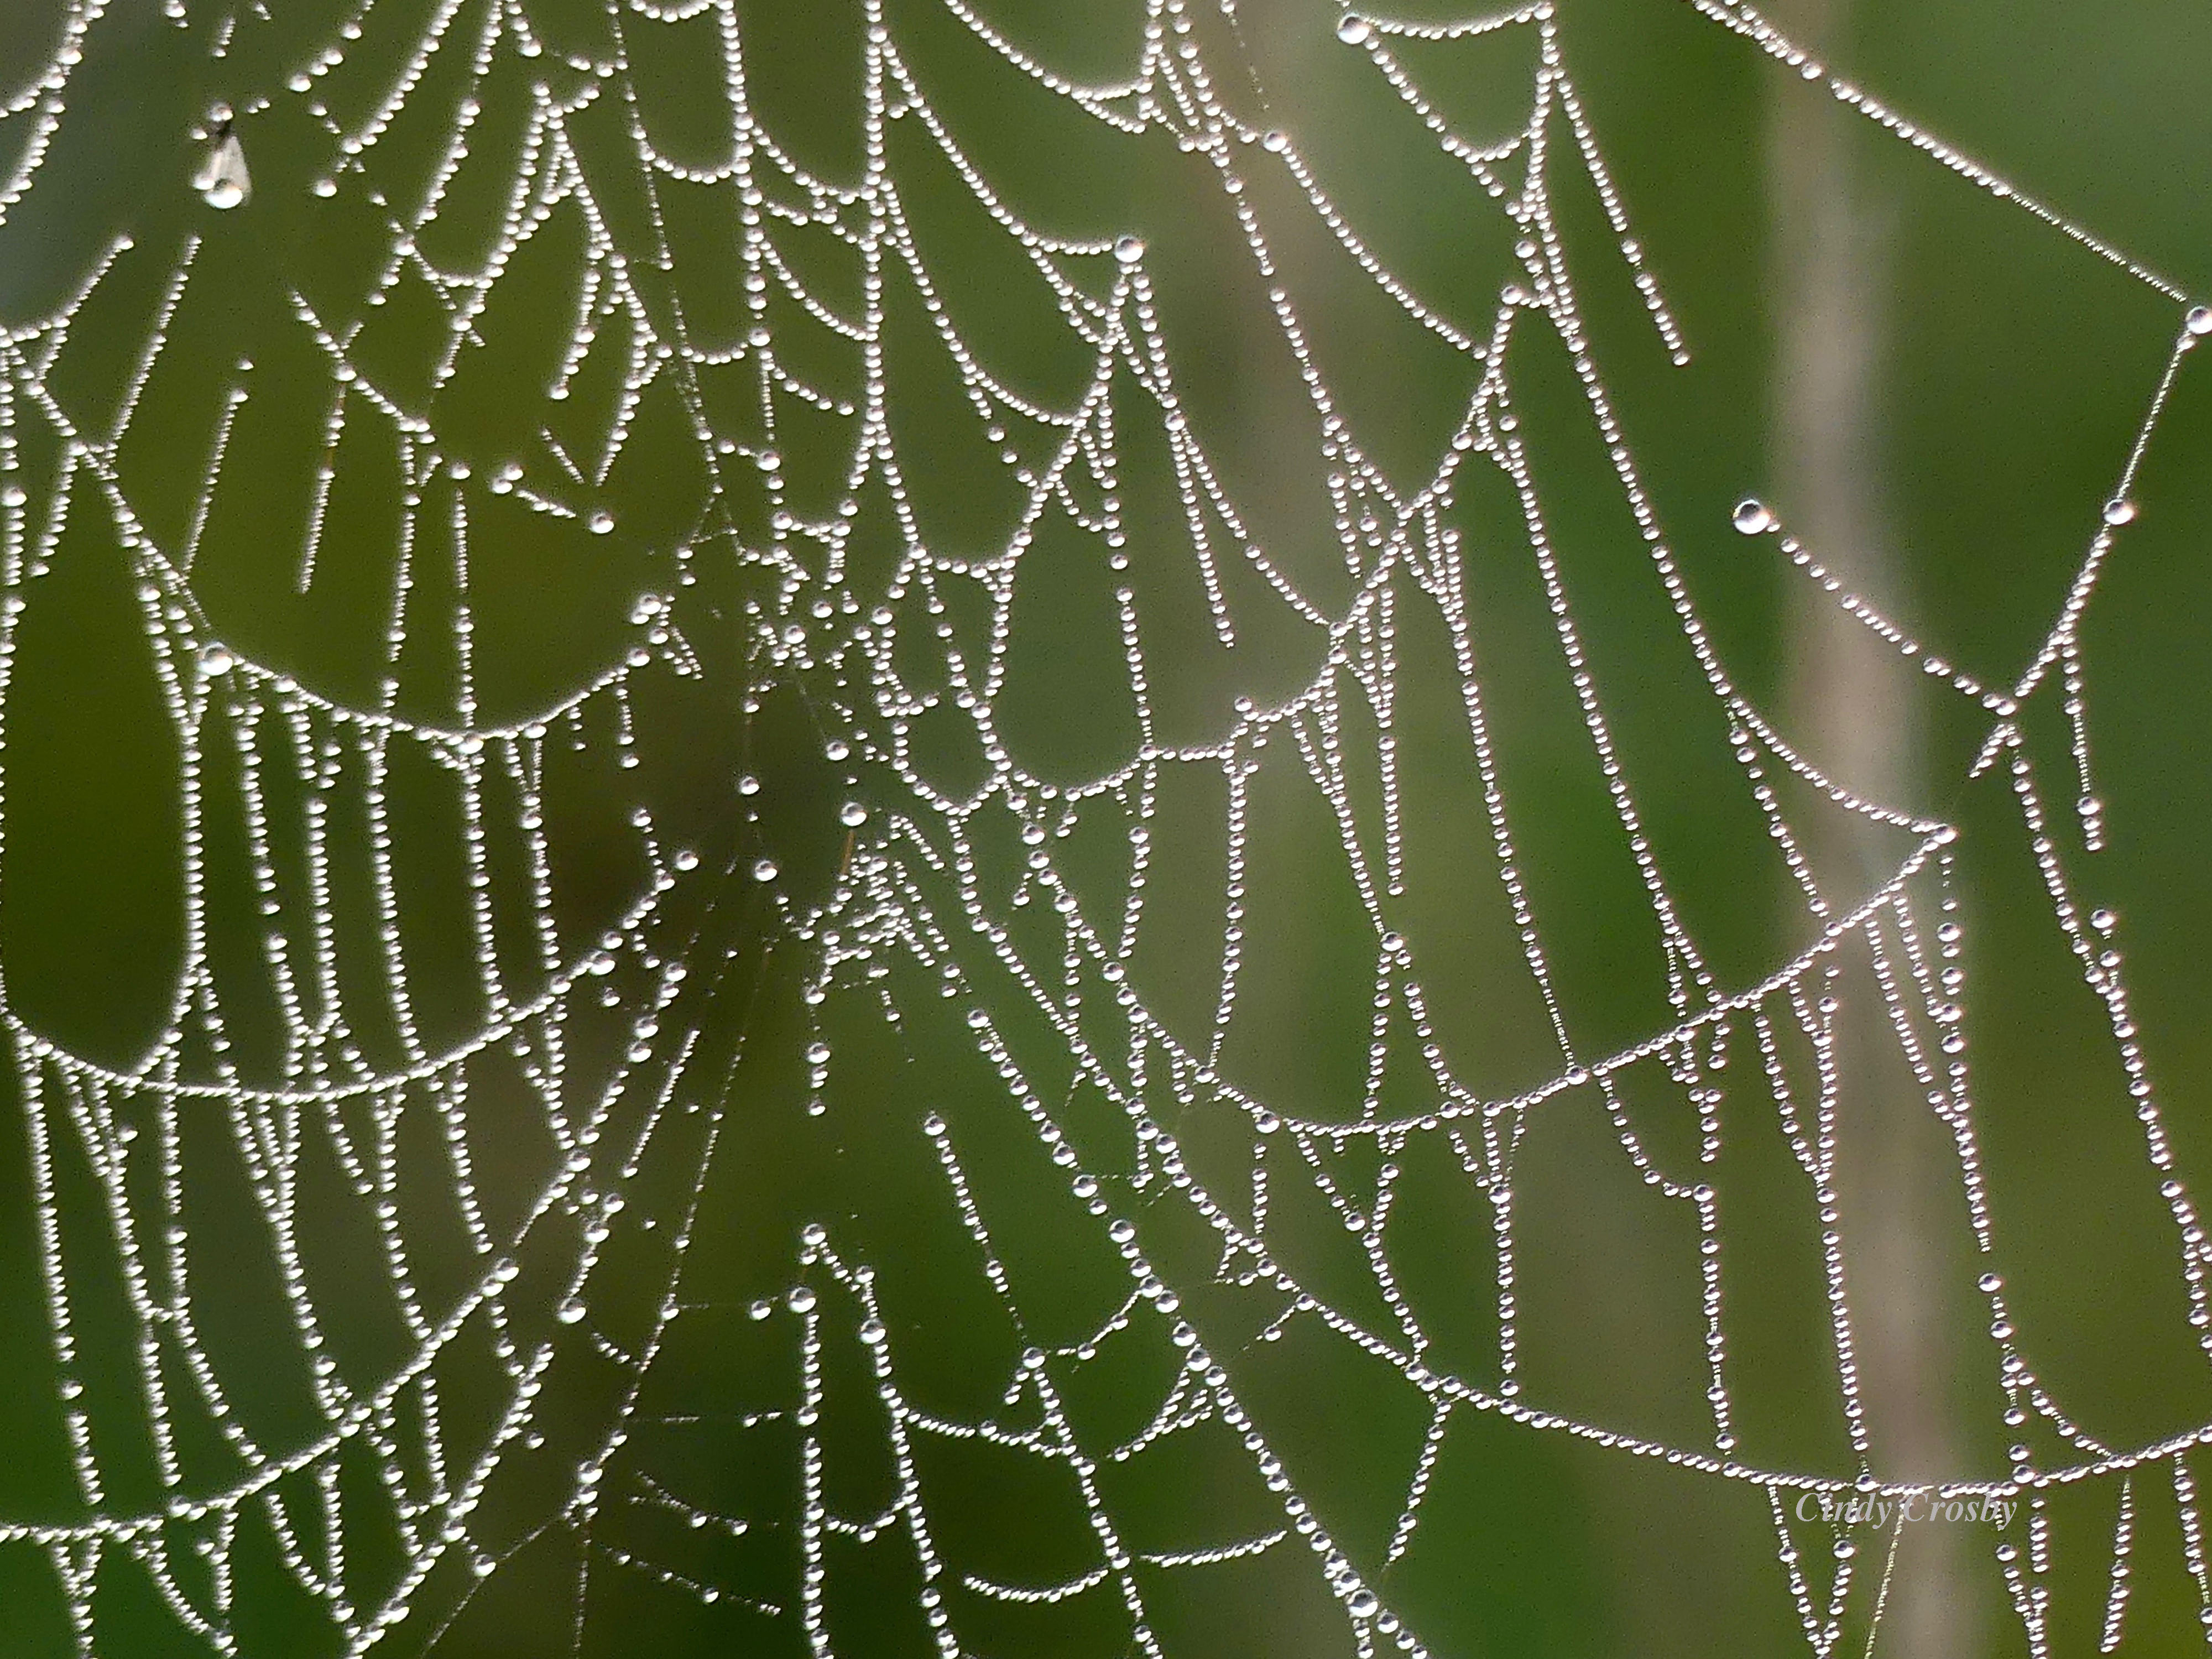 spiderwebcloseupSPMA93019WMfogdew.jpg